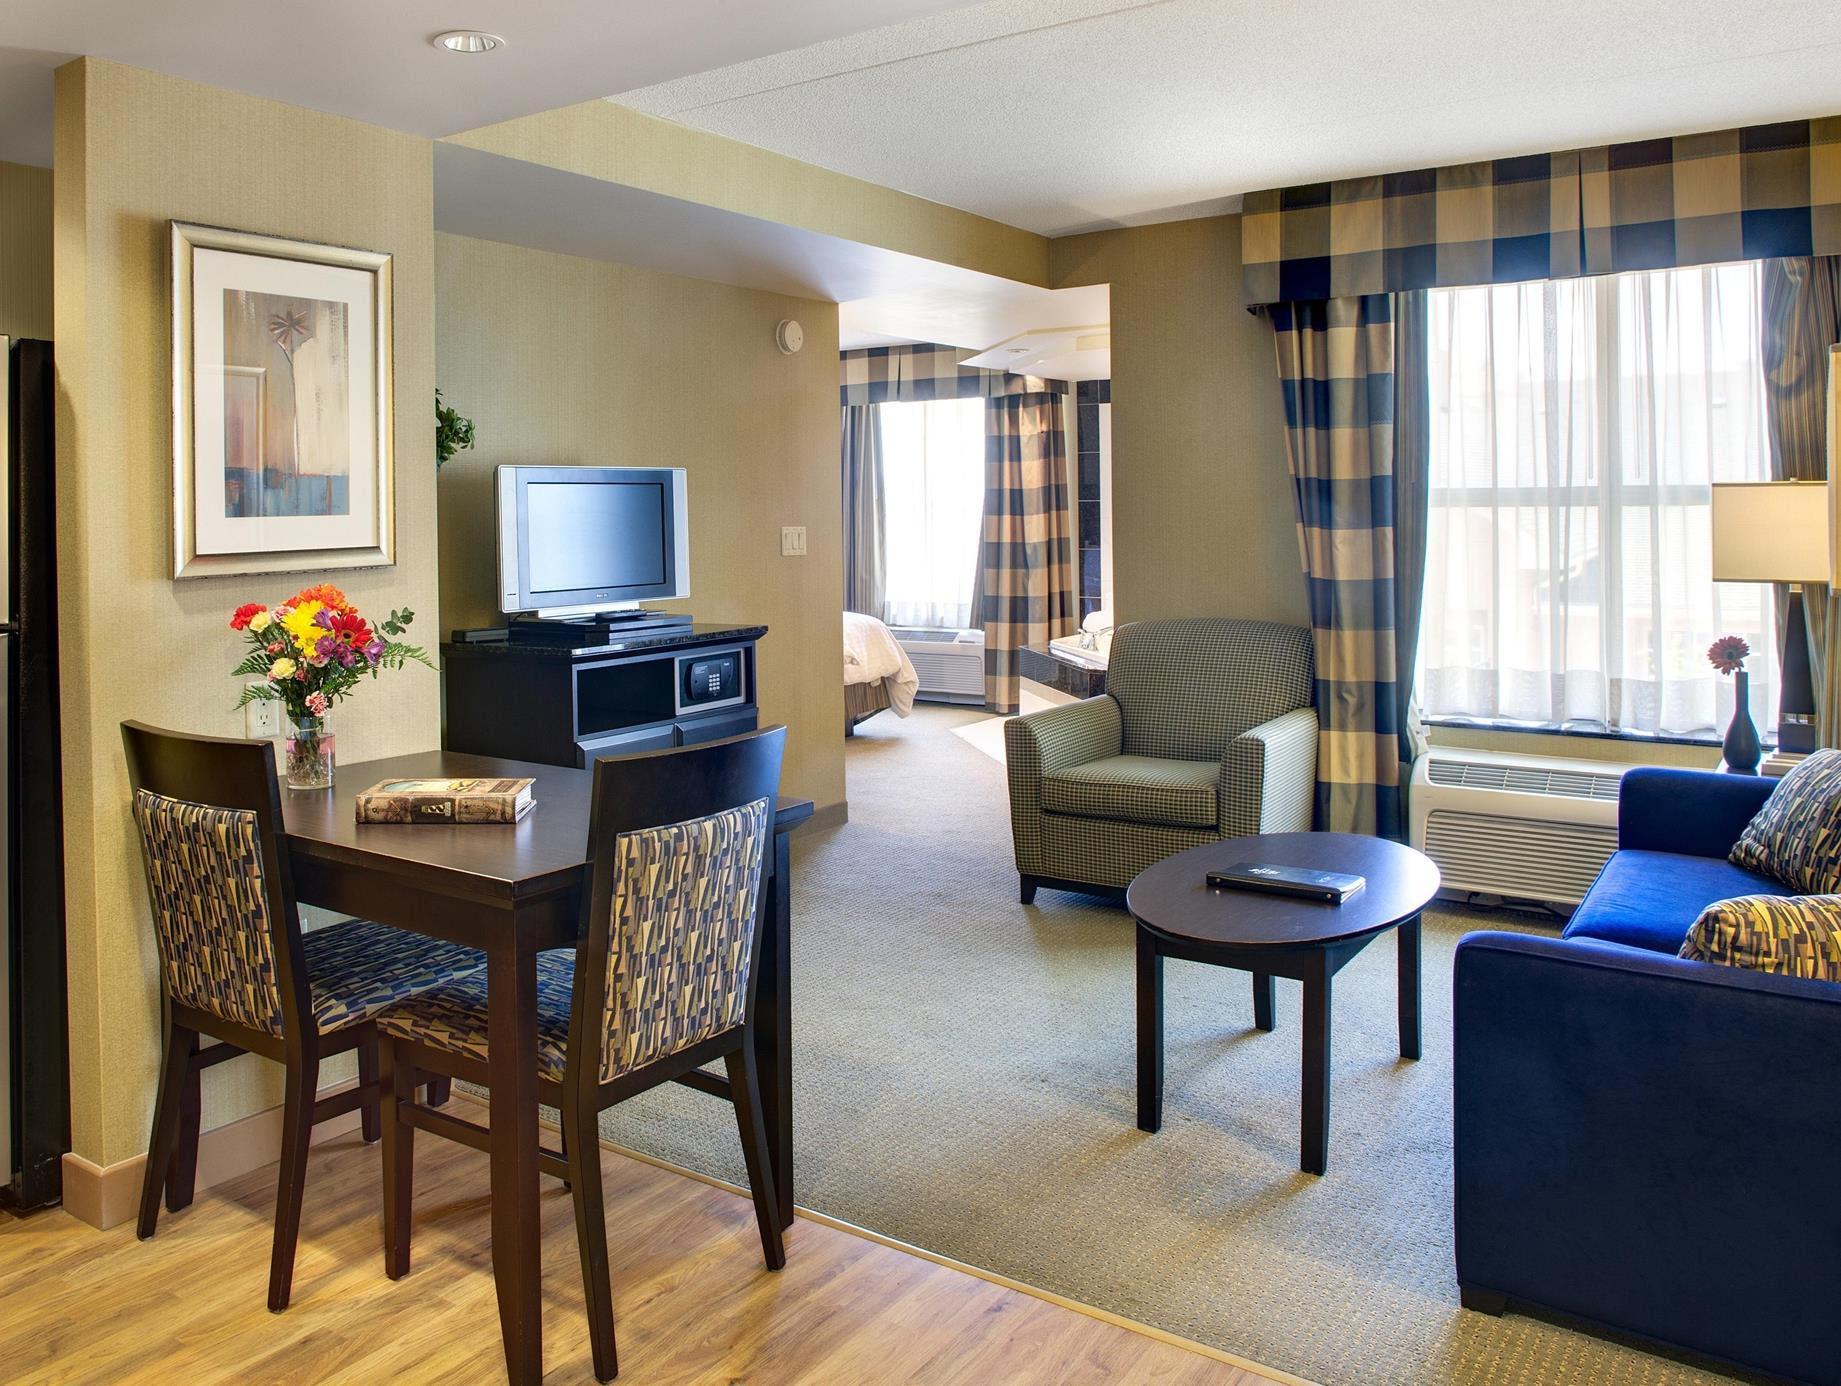 Price Homewood Suites by Hilton London Ontario